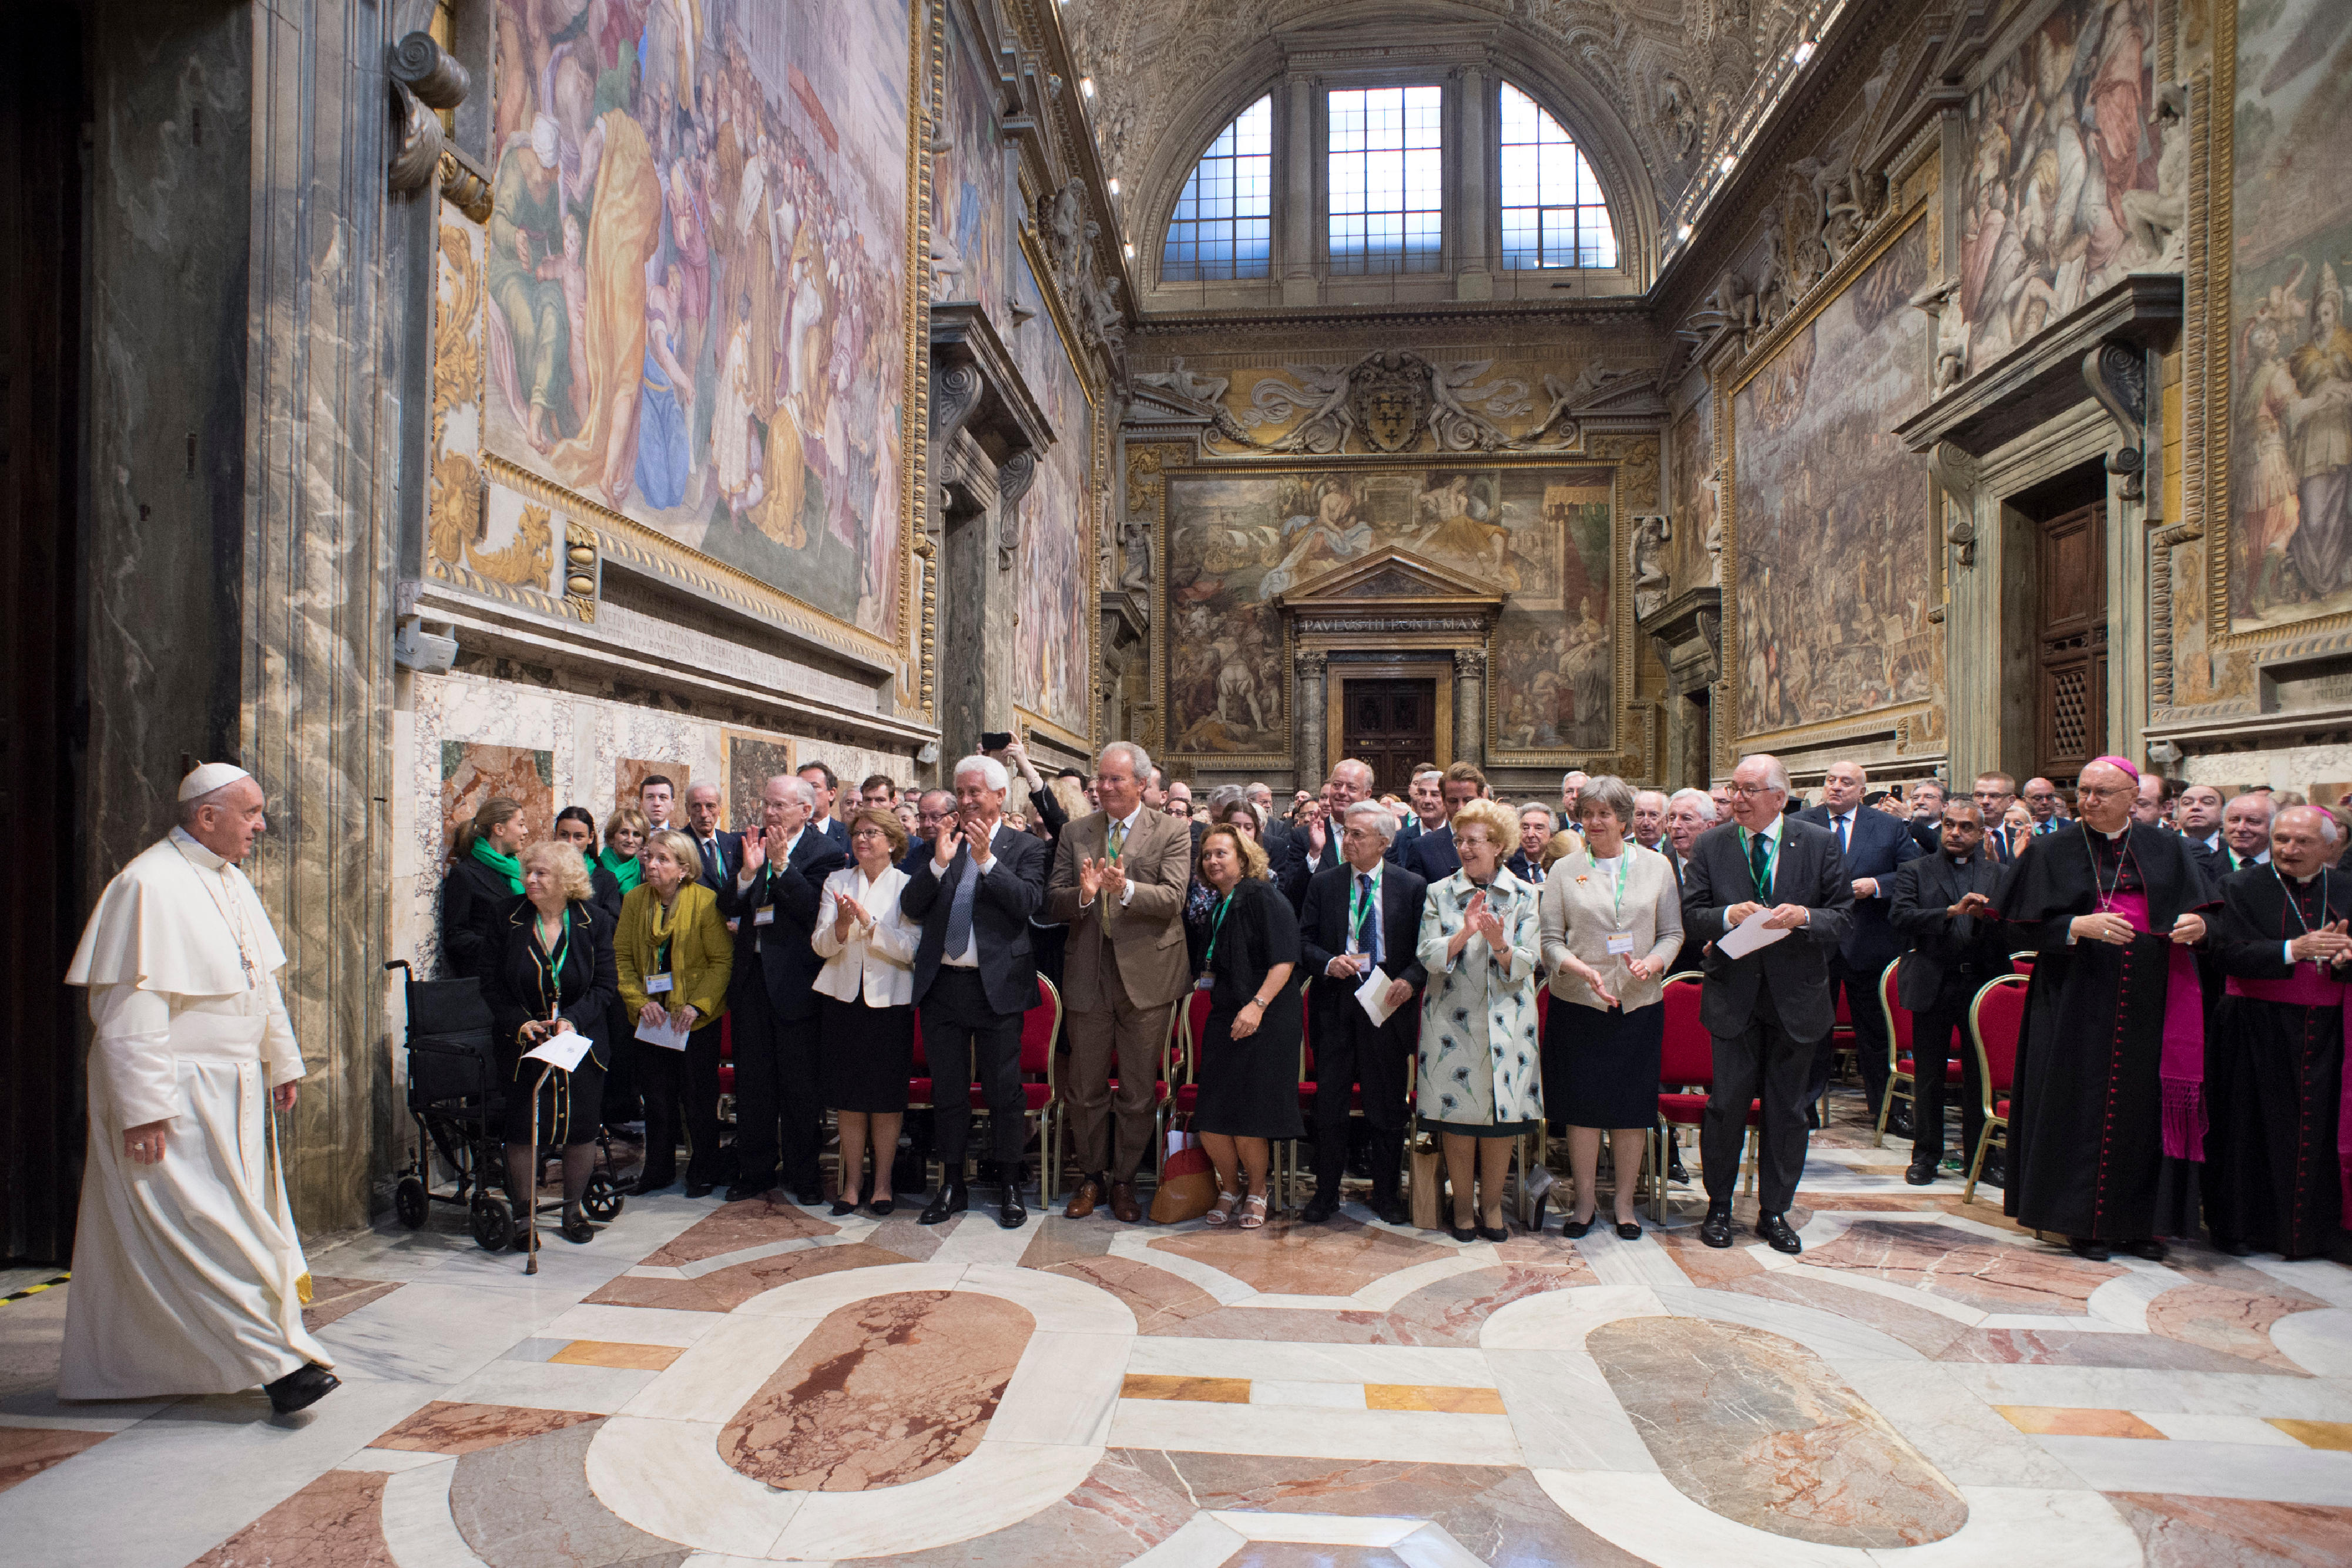 Pope Francis: Economic Crisis Has Ethical Dimension